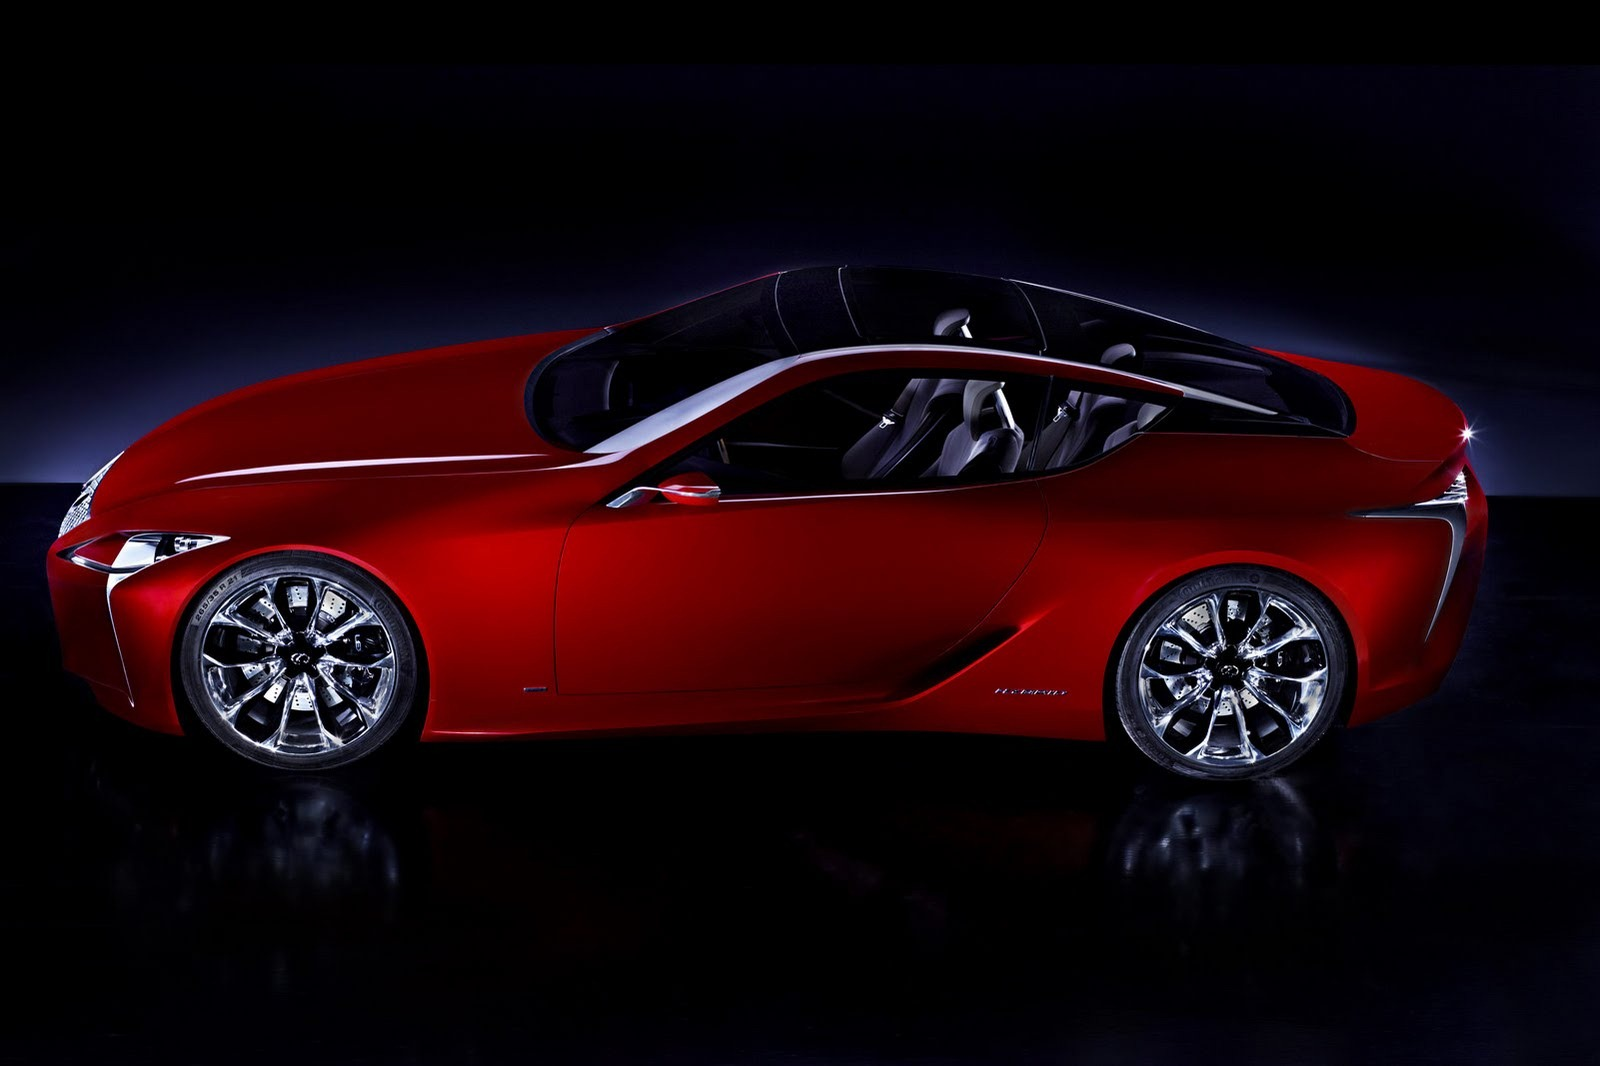 2012_lexus_lf_lc_hybrid_supercar_concept_02a